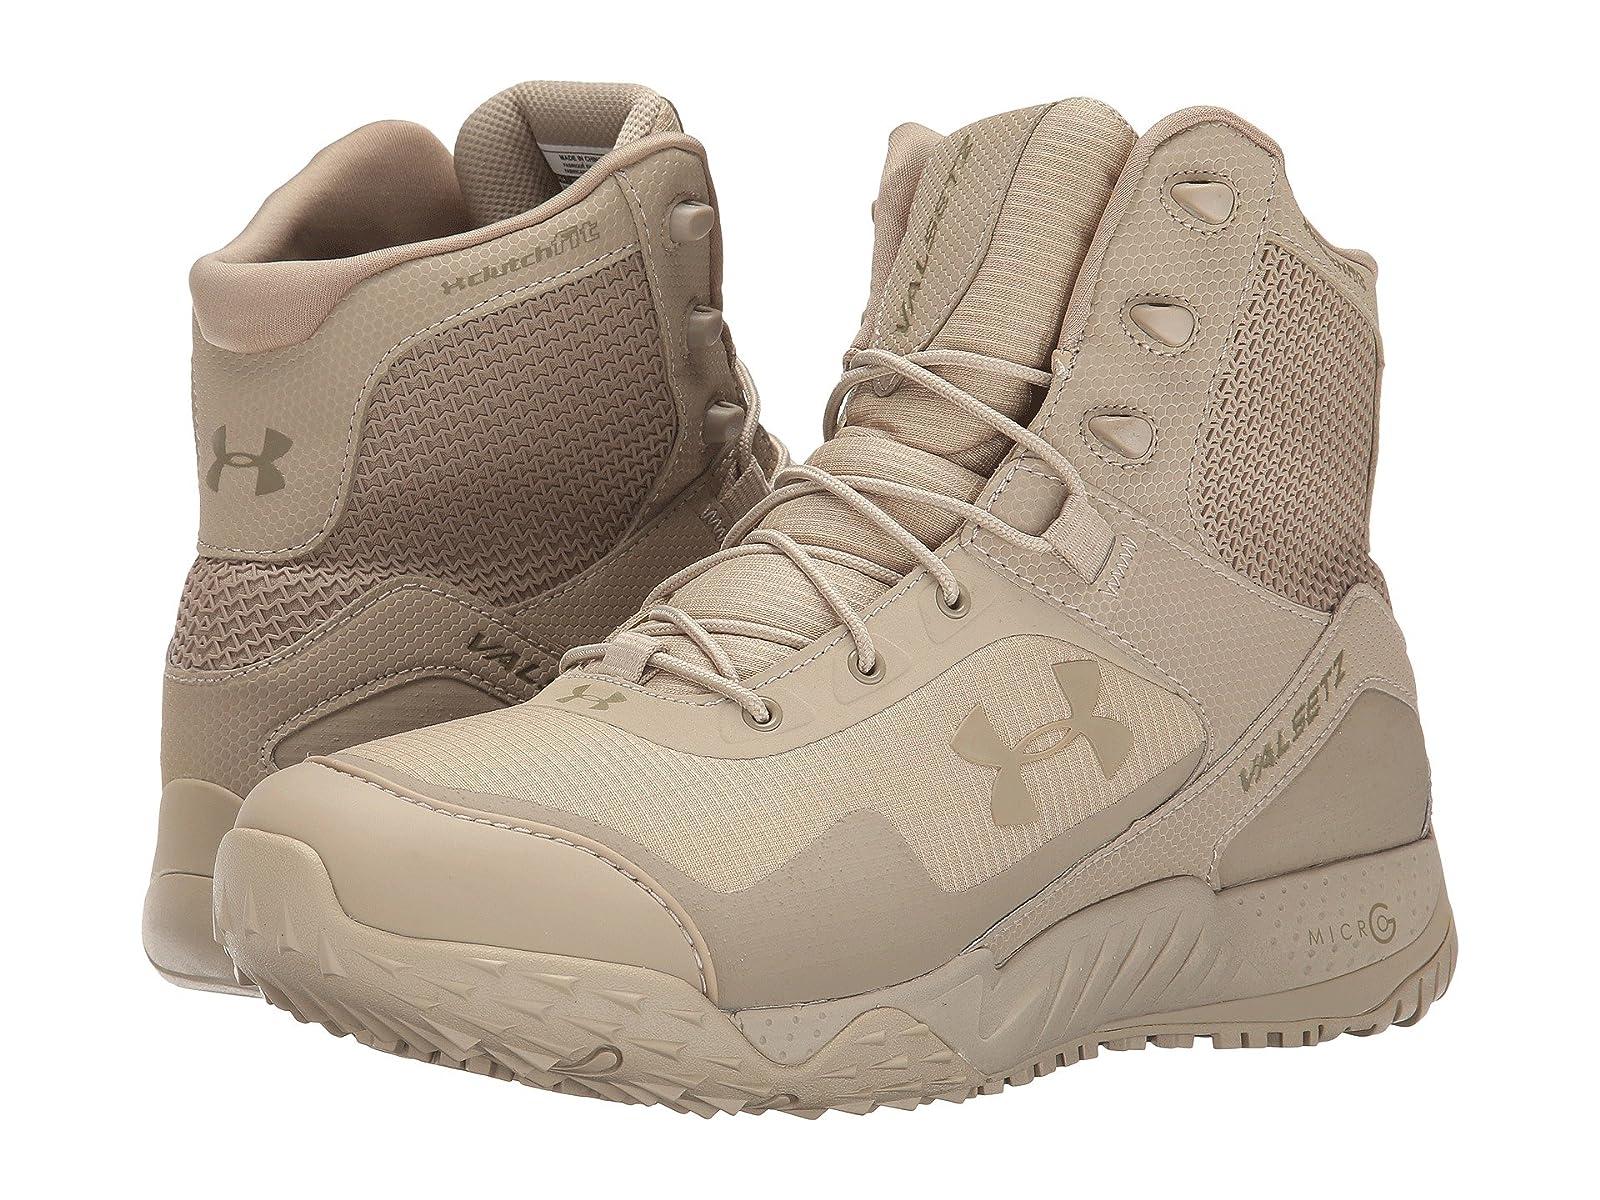 Under Armour UA Valsetz RTSEconomical and quality shoes